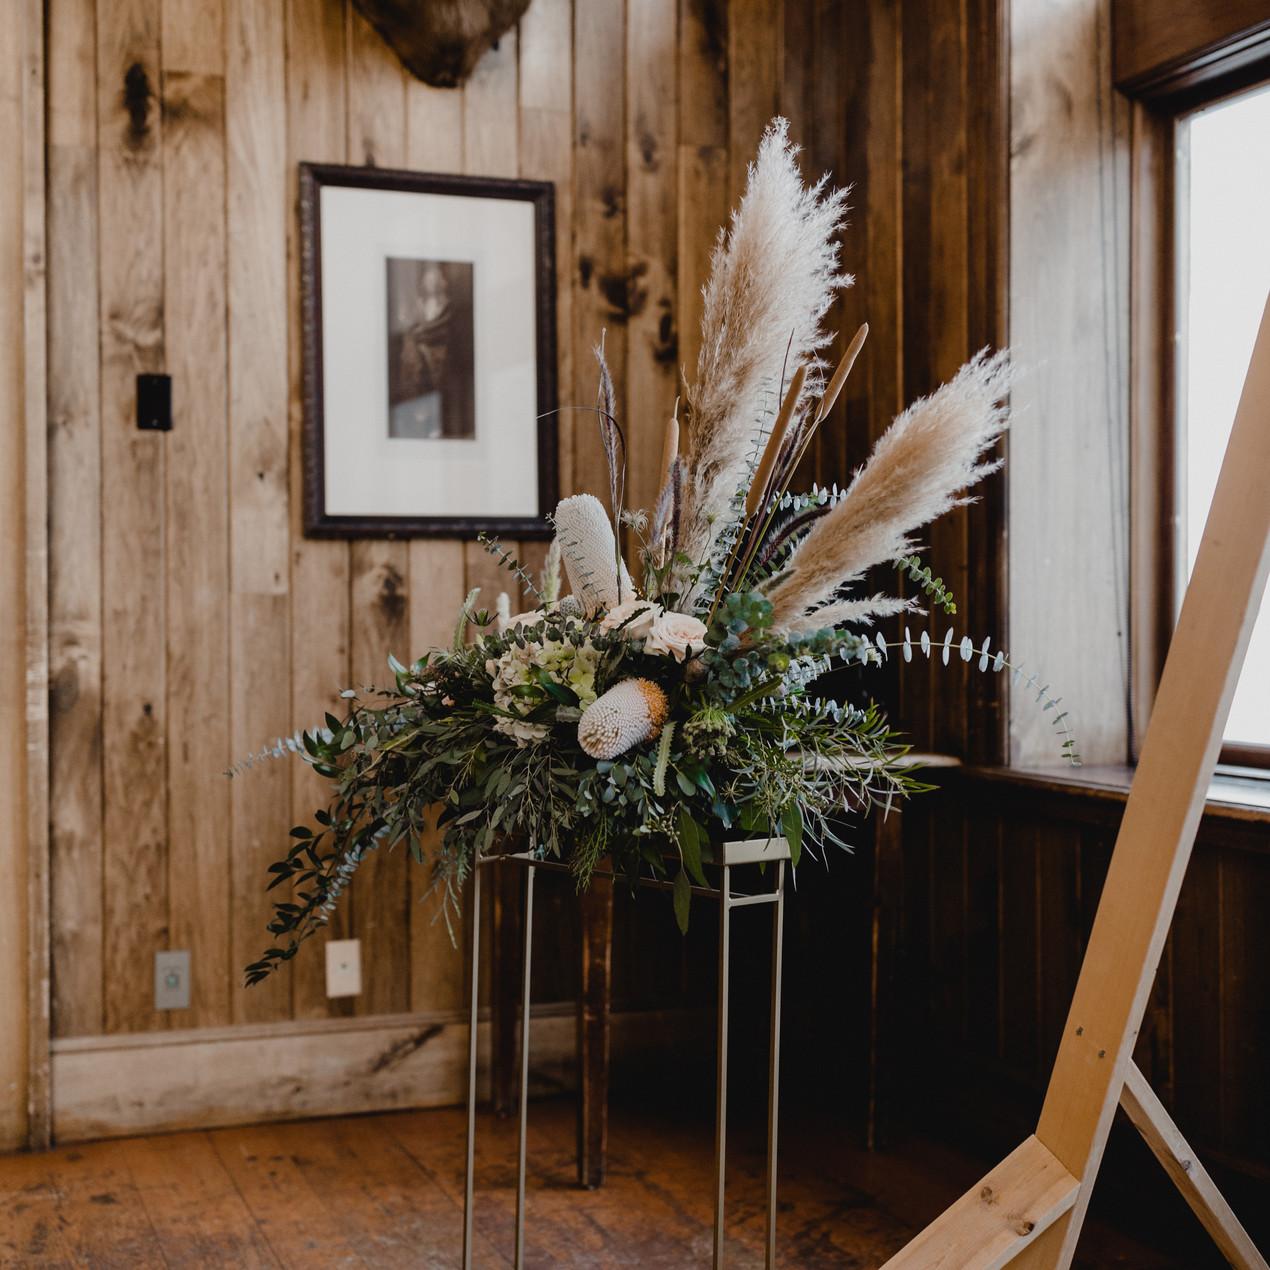 Colorado Mountain Wedding. Beaver Creek Winter Wedding. Glam Saddleridge wedding. Velvet and green detailed wedding.